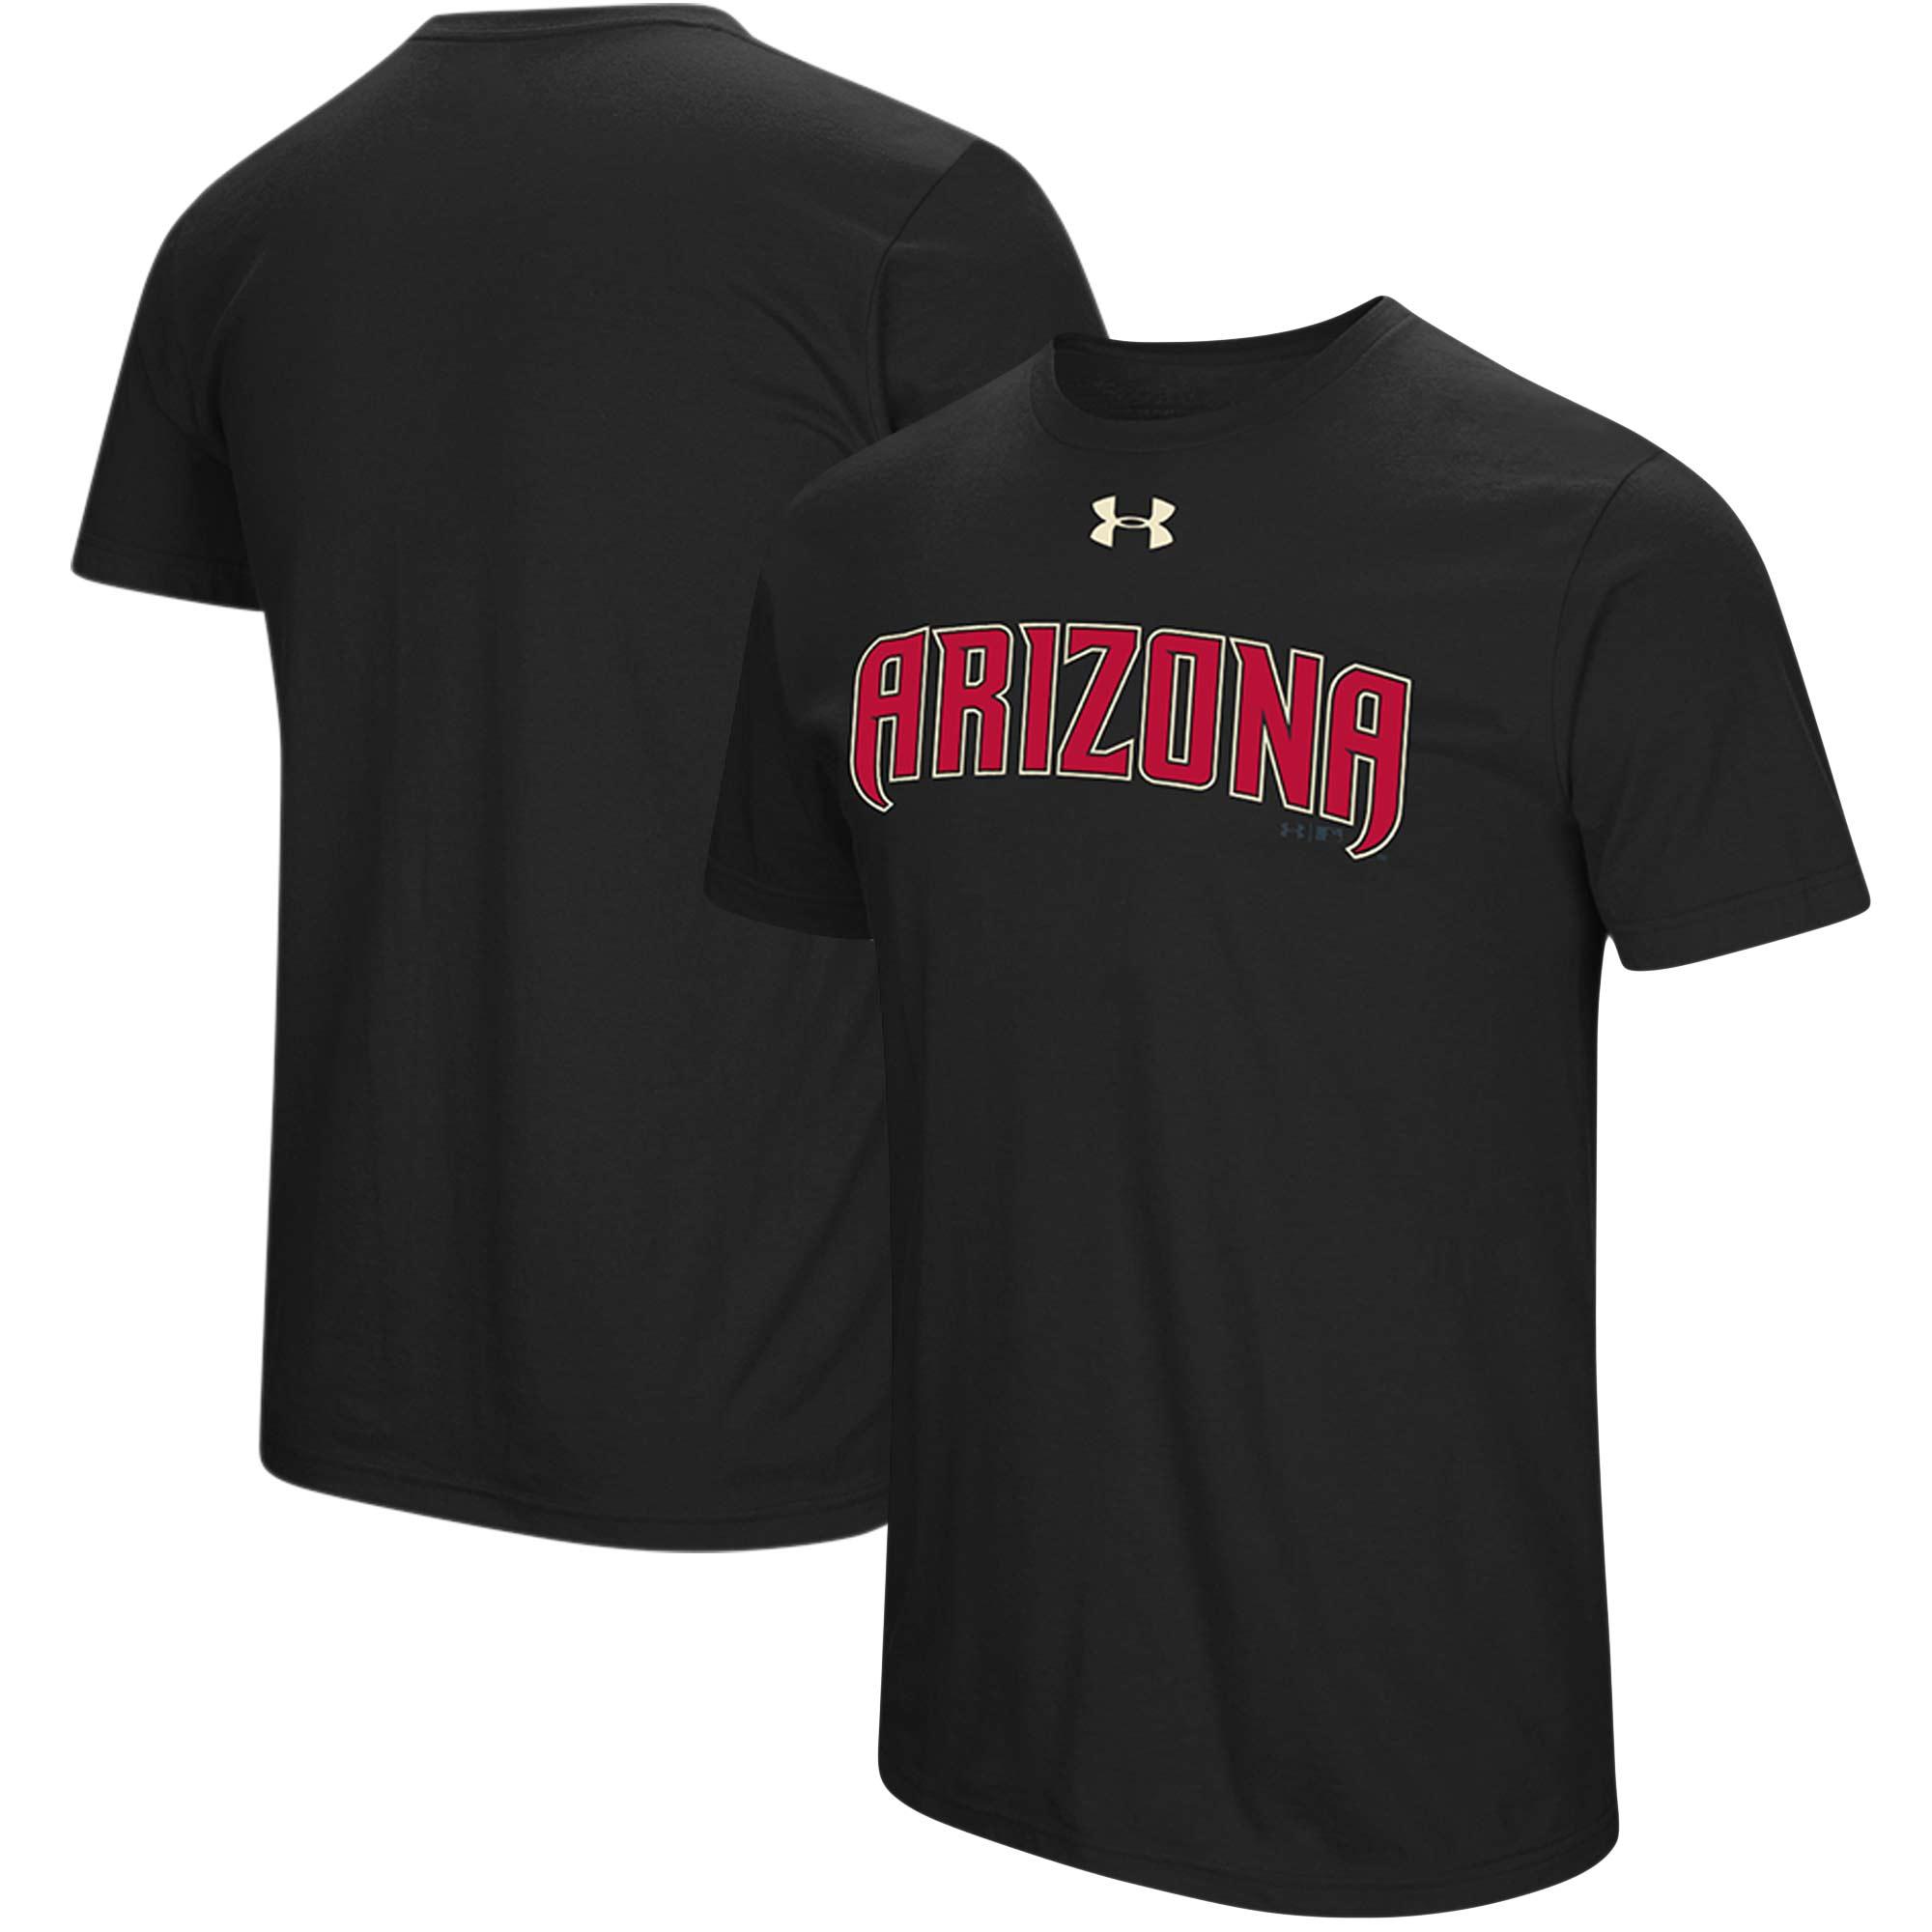 Arizona Diamondbacks Under Armour Passion Road Team Font T-Shirt - Black